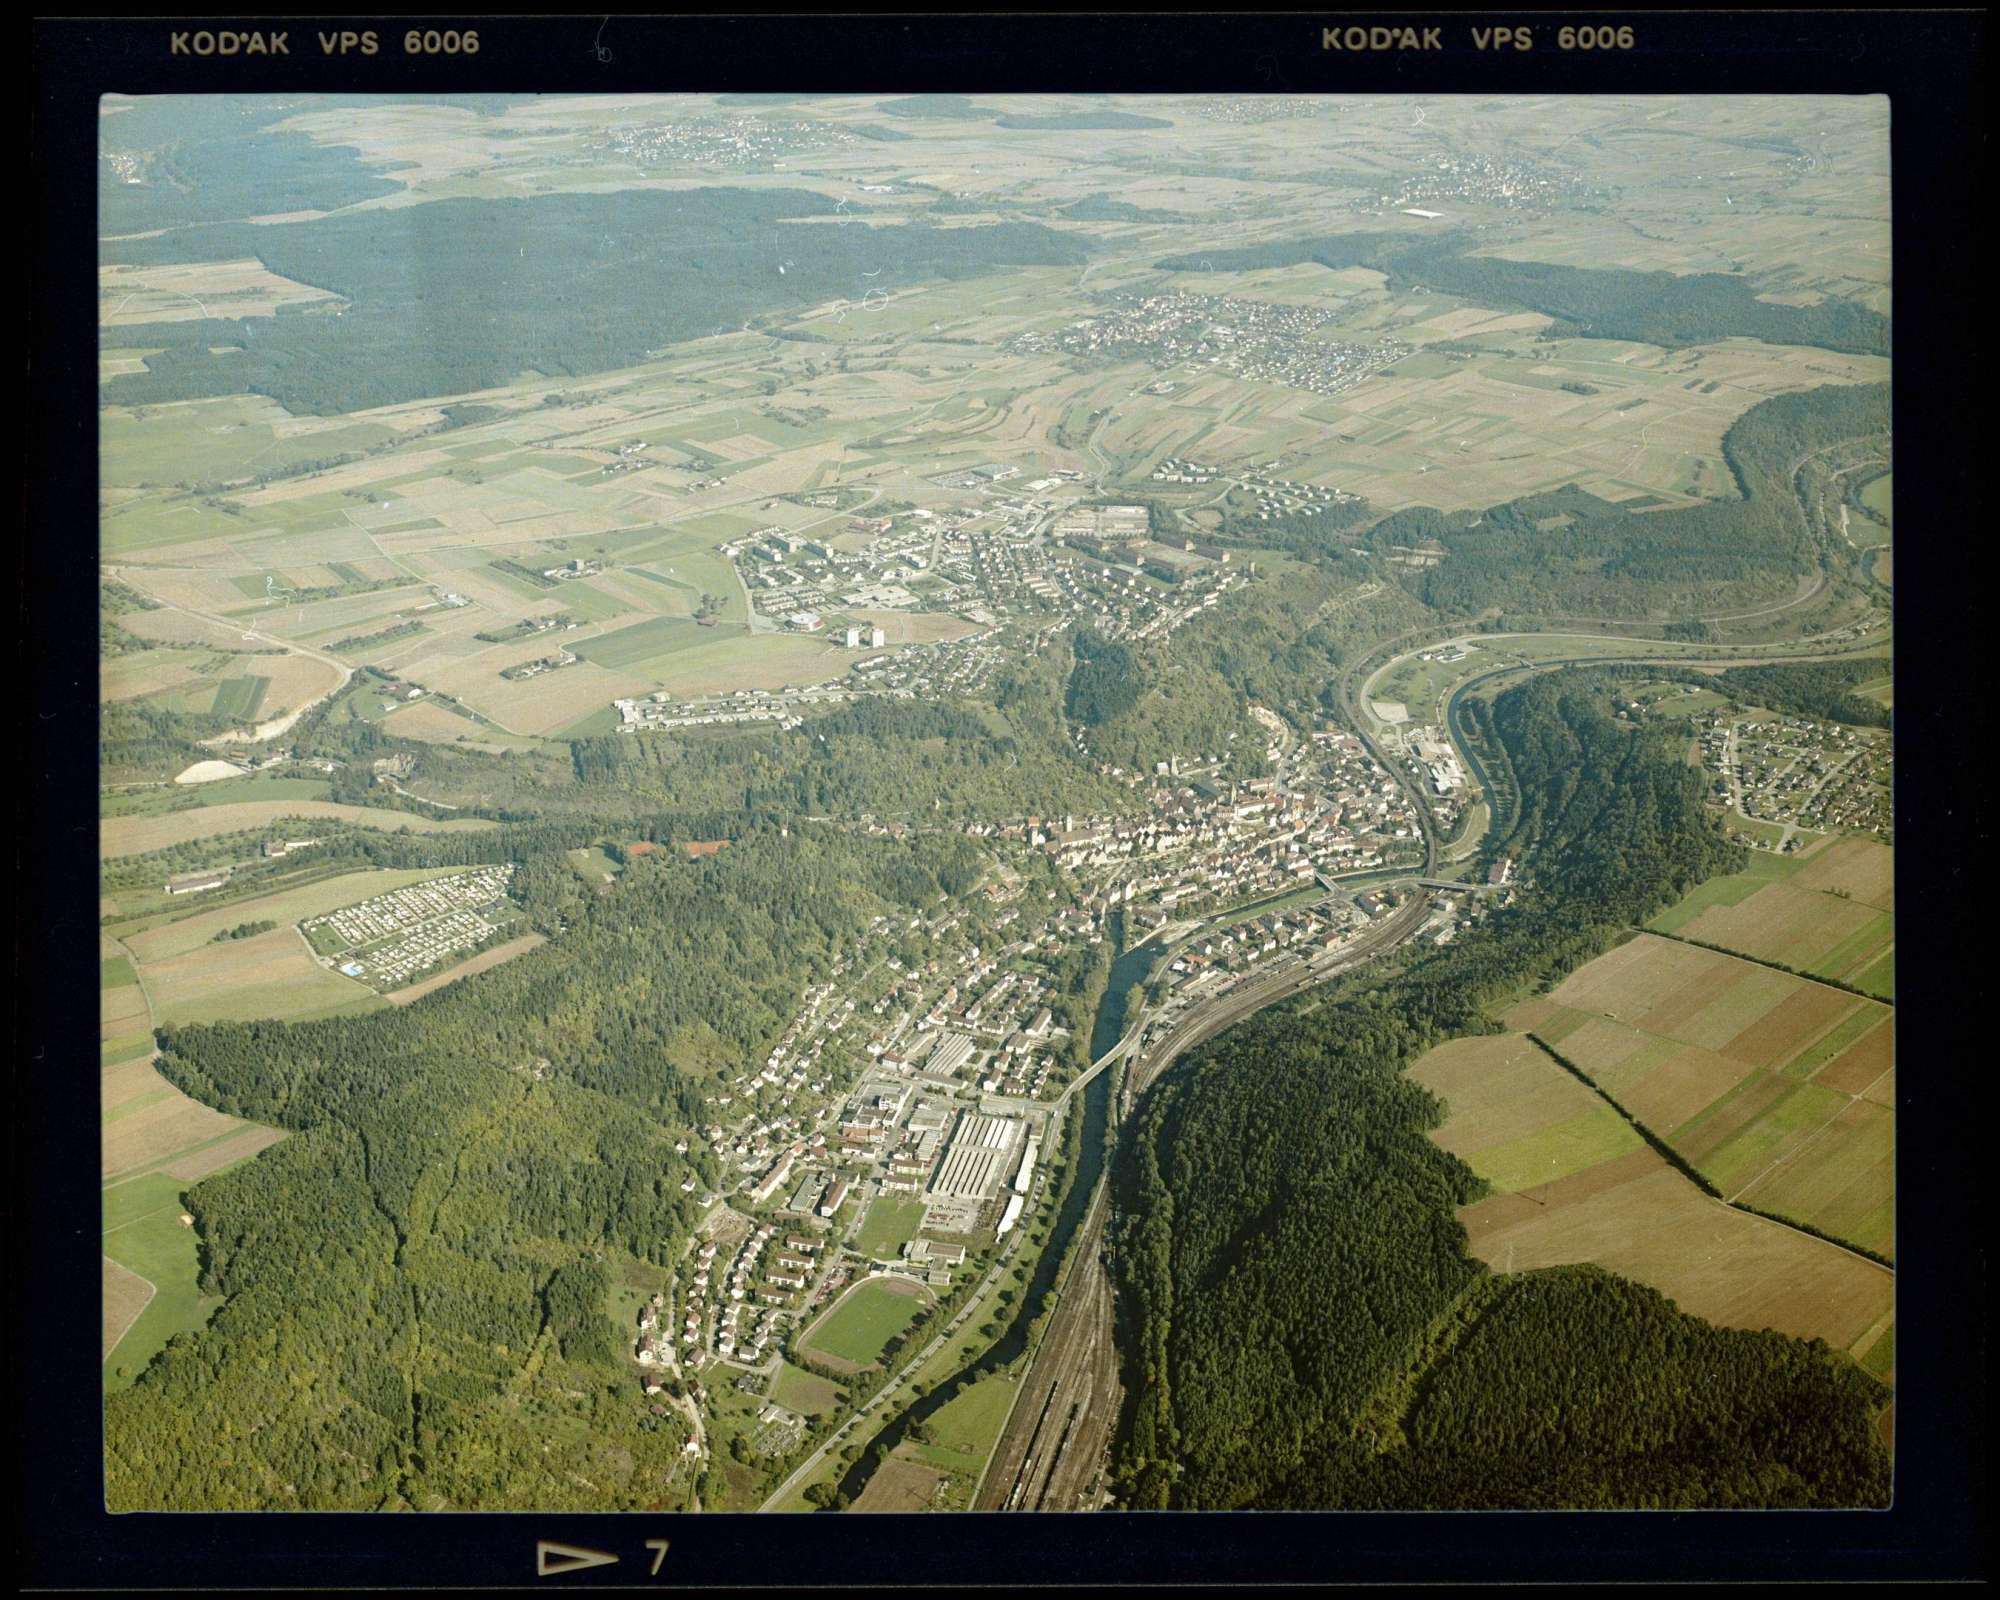 Horb am Neckar, Luftbild, Bild 1